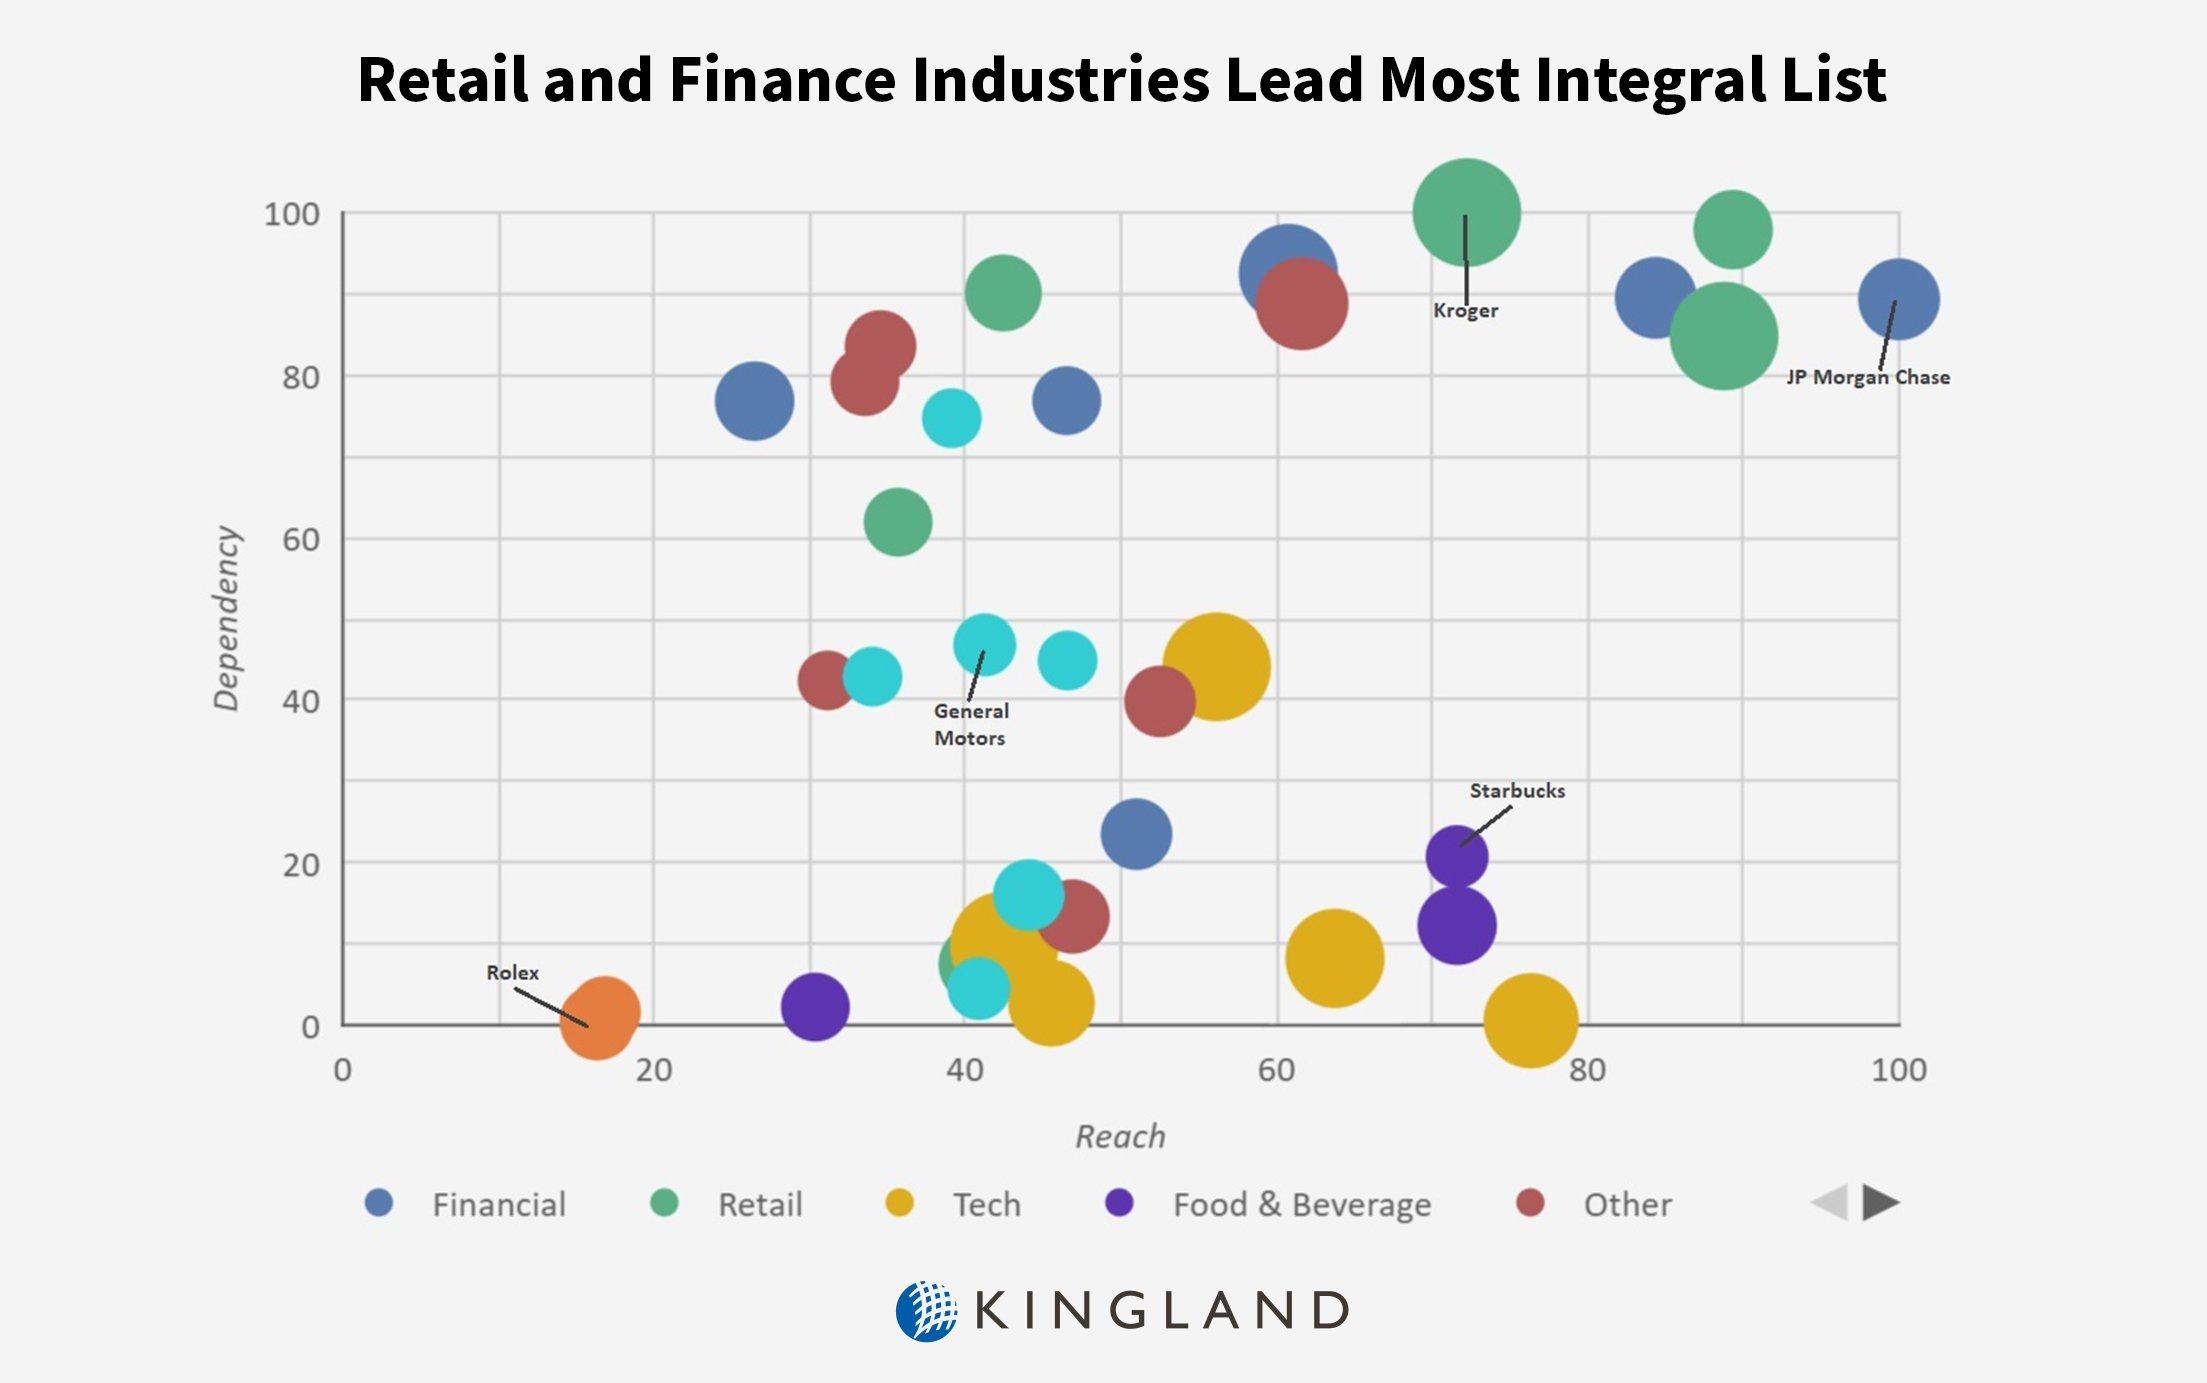 RetailandFinanceIndustriesLeadIntegralList